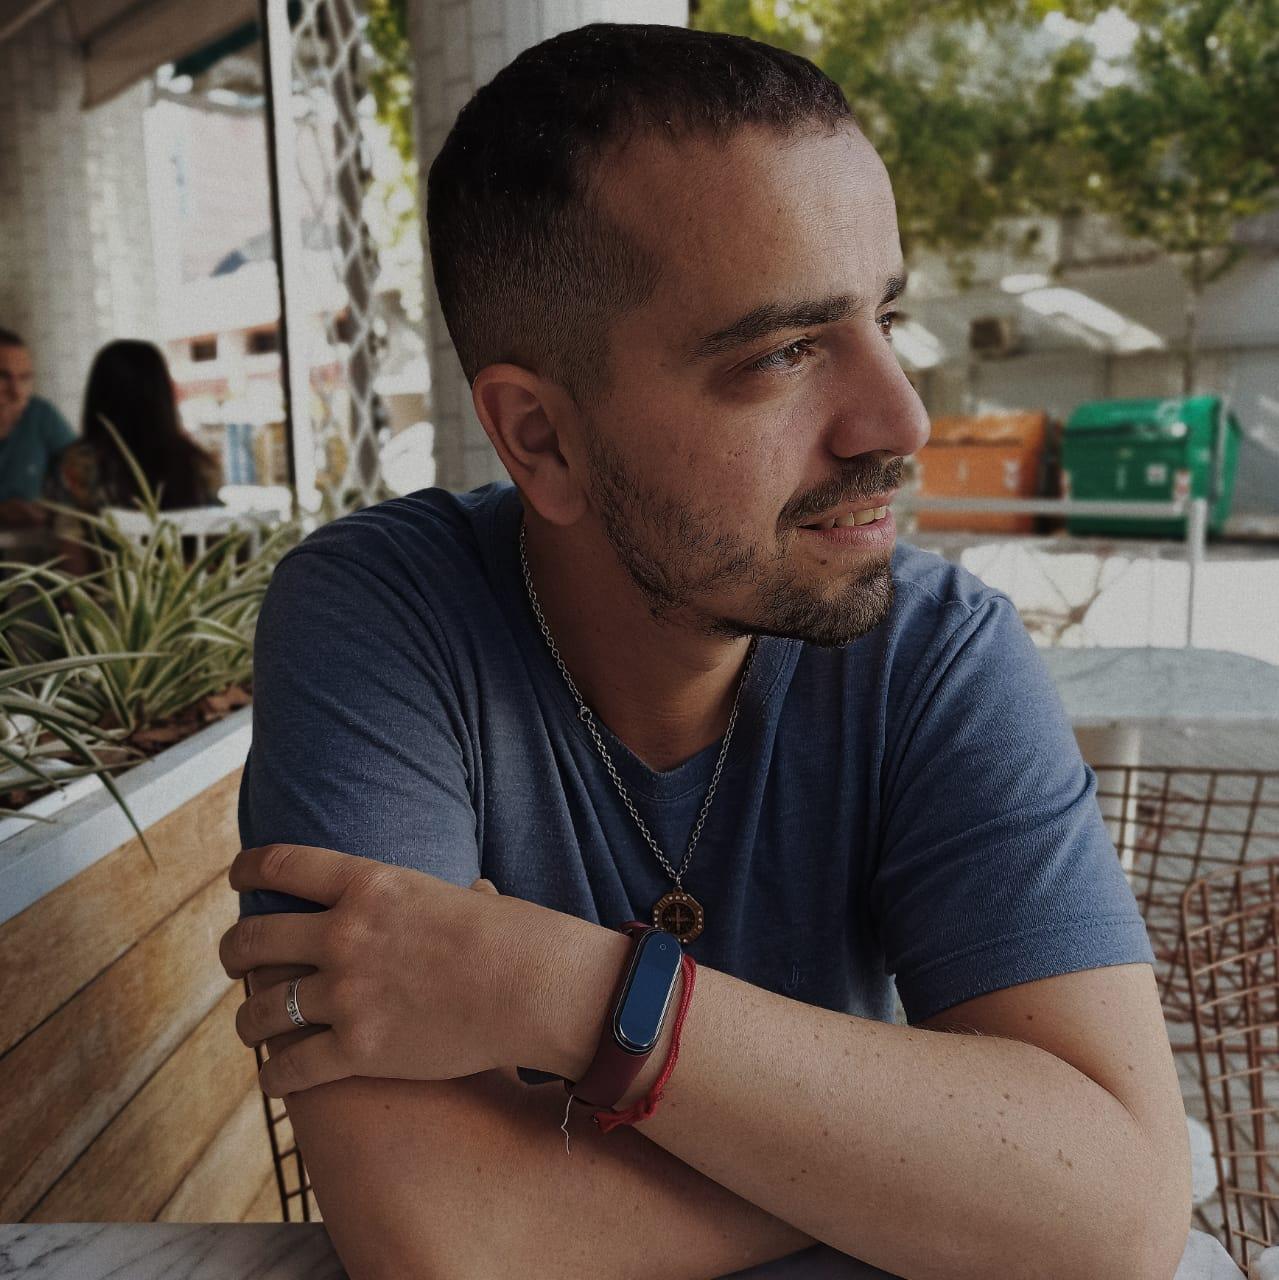 Guillermo Fechenbach